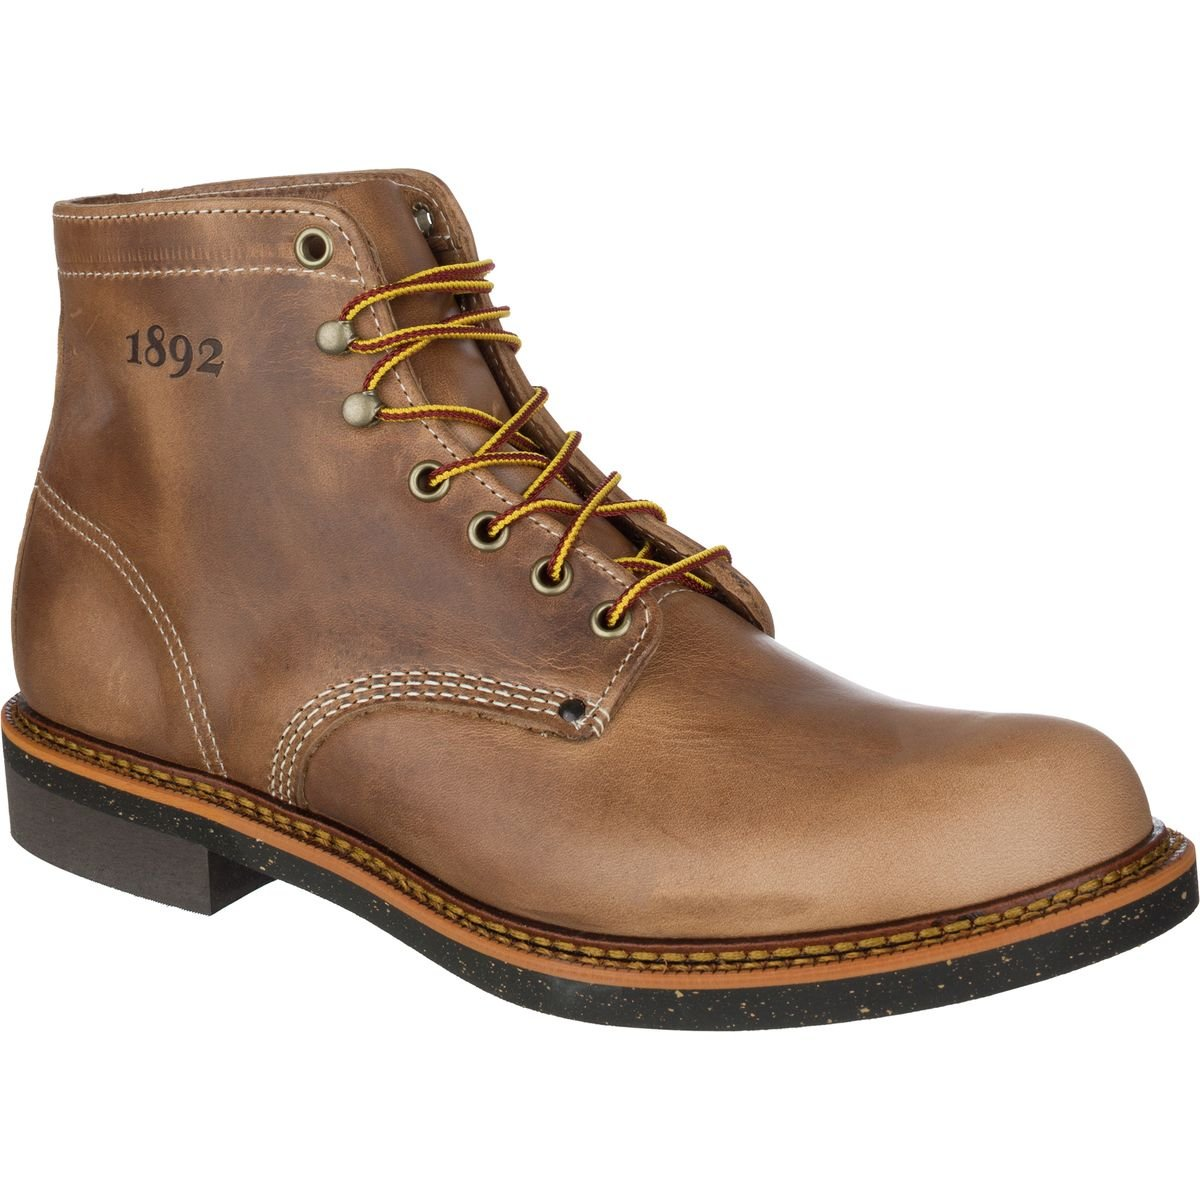 2f98ef4f23a Thorogood Beloit Boot - Men's